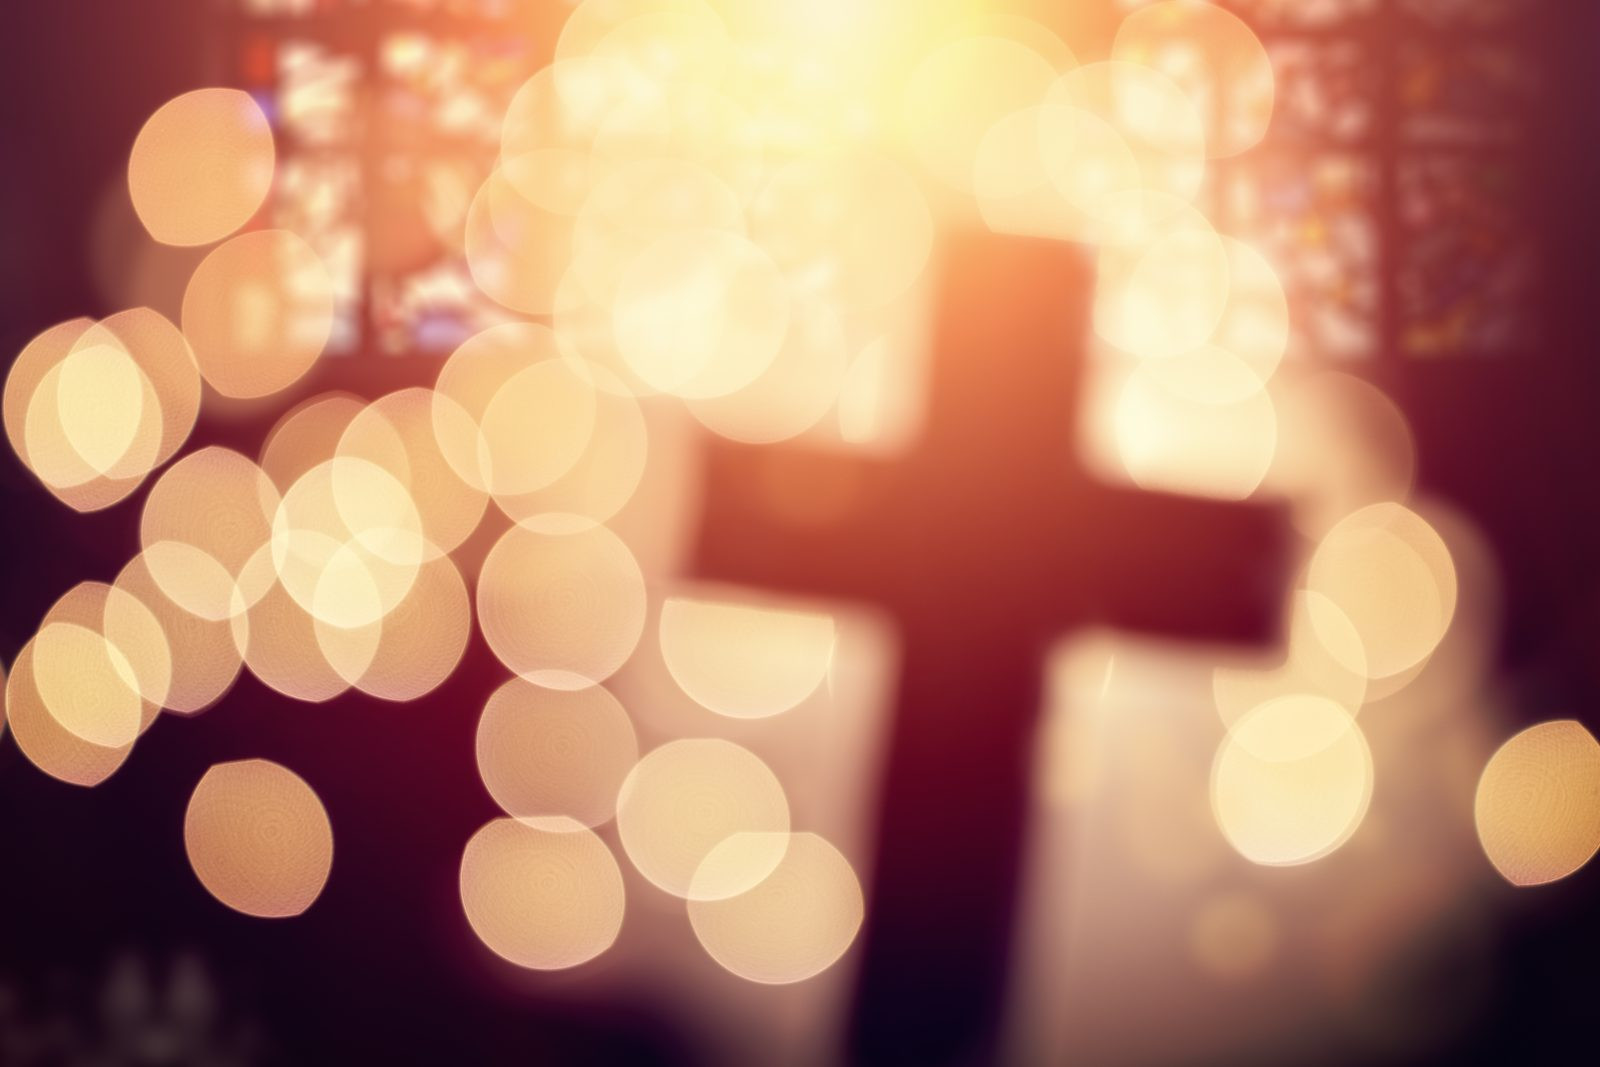 photodune-21604421-abstract-cross-in-church-interior-xxl